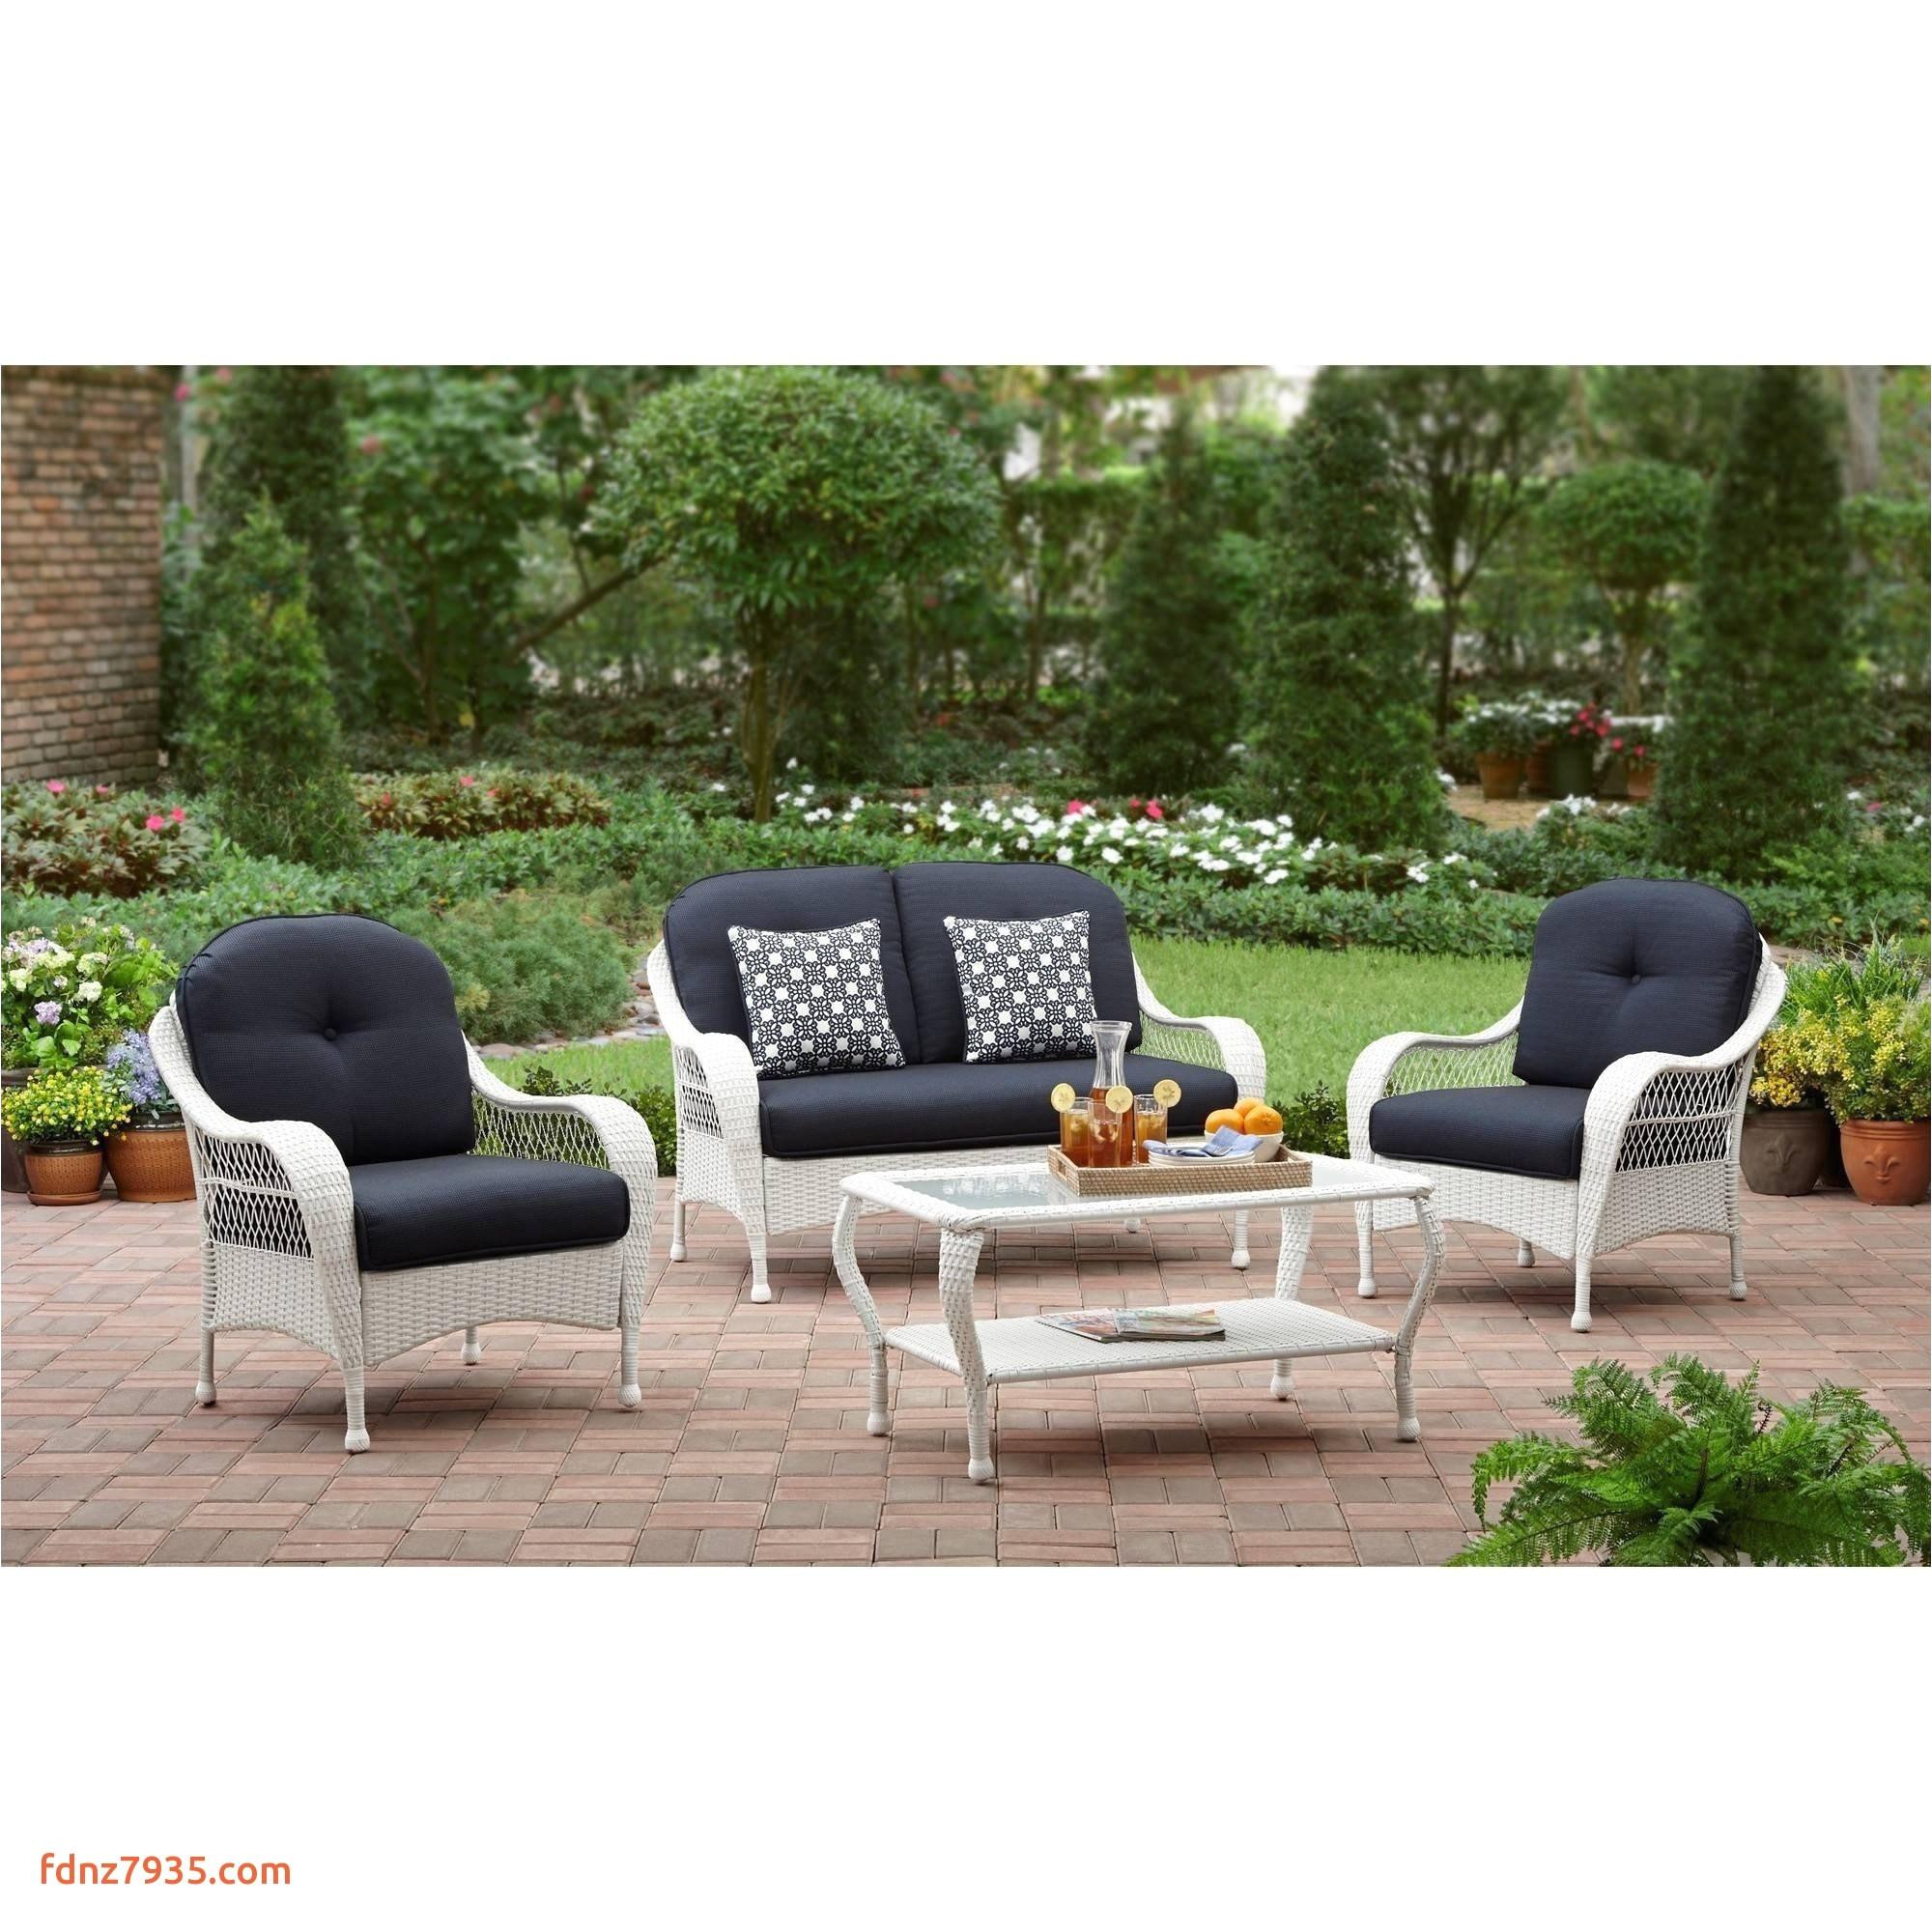 bedroom charming outdoor conversation furniture 24 wicker patio set best sofa 0d 1 conversation outdoor furniture